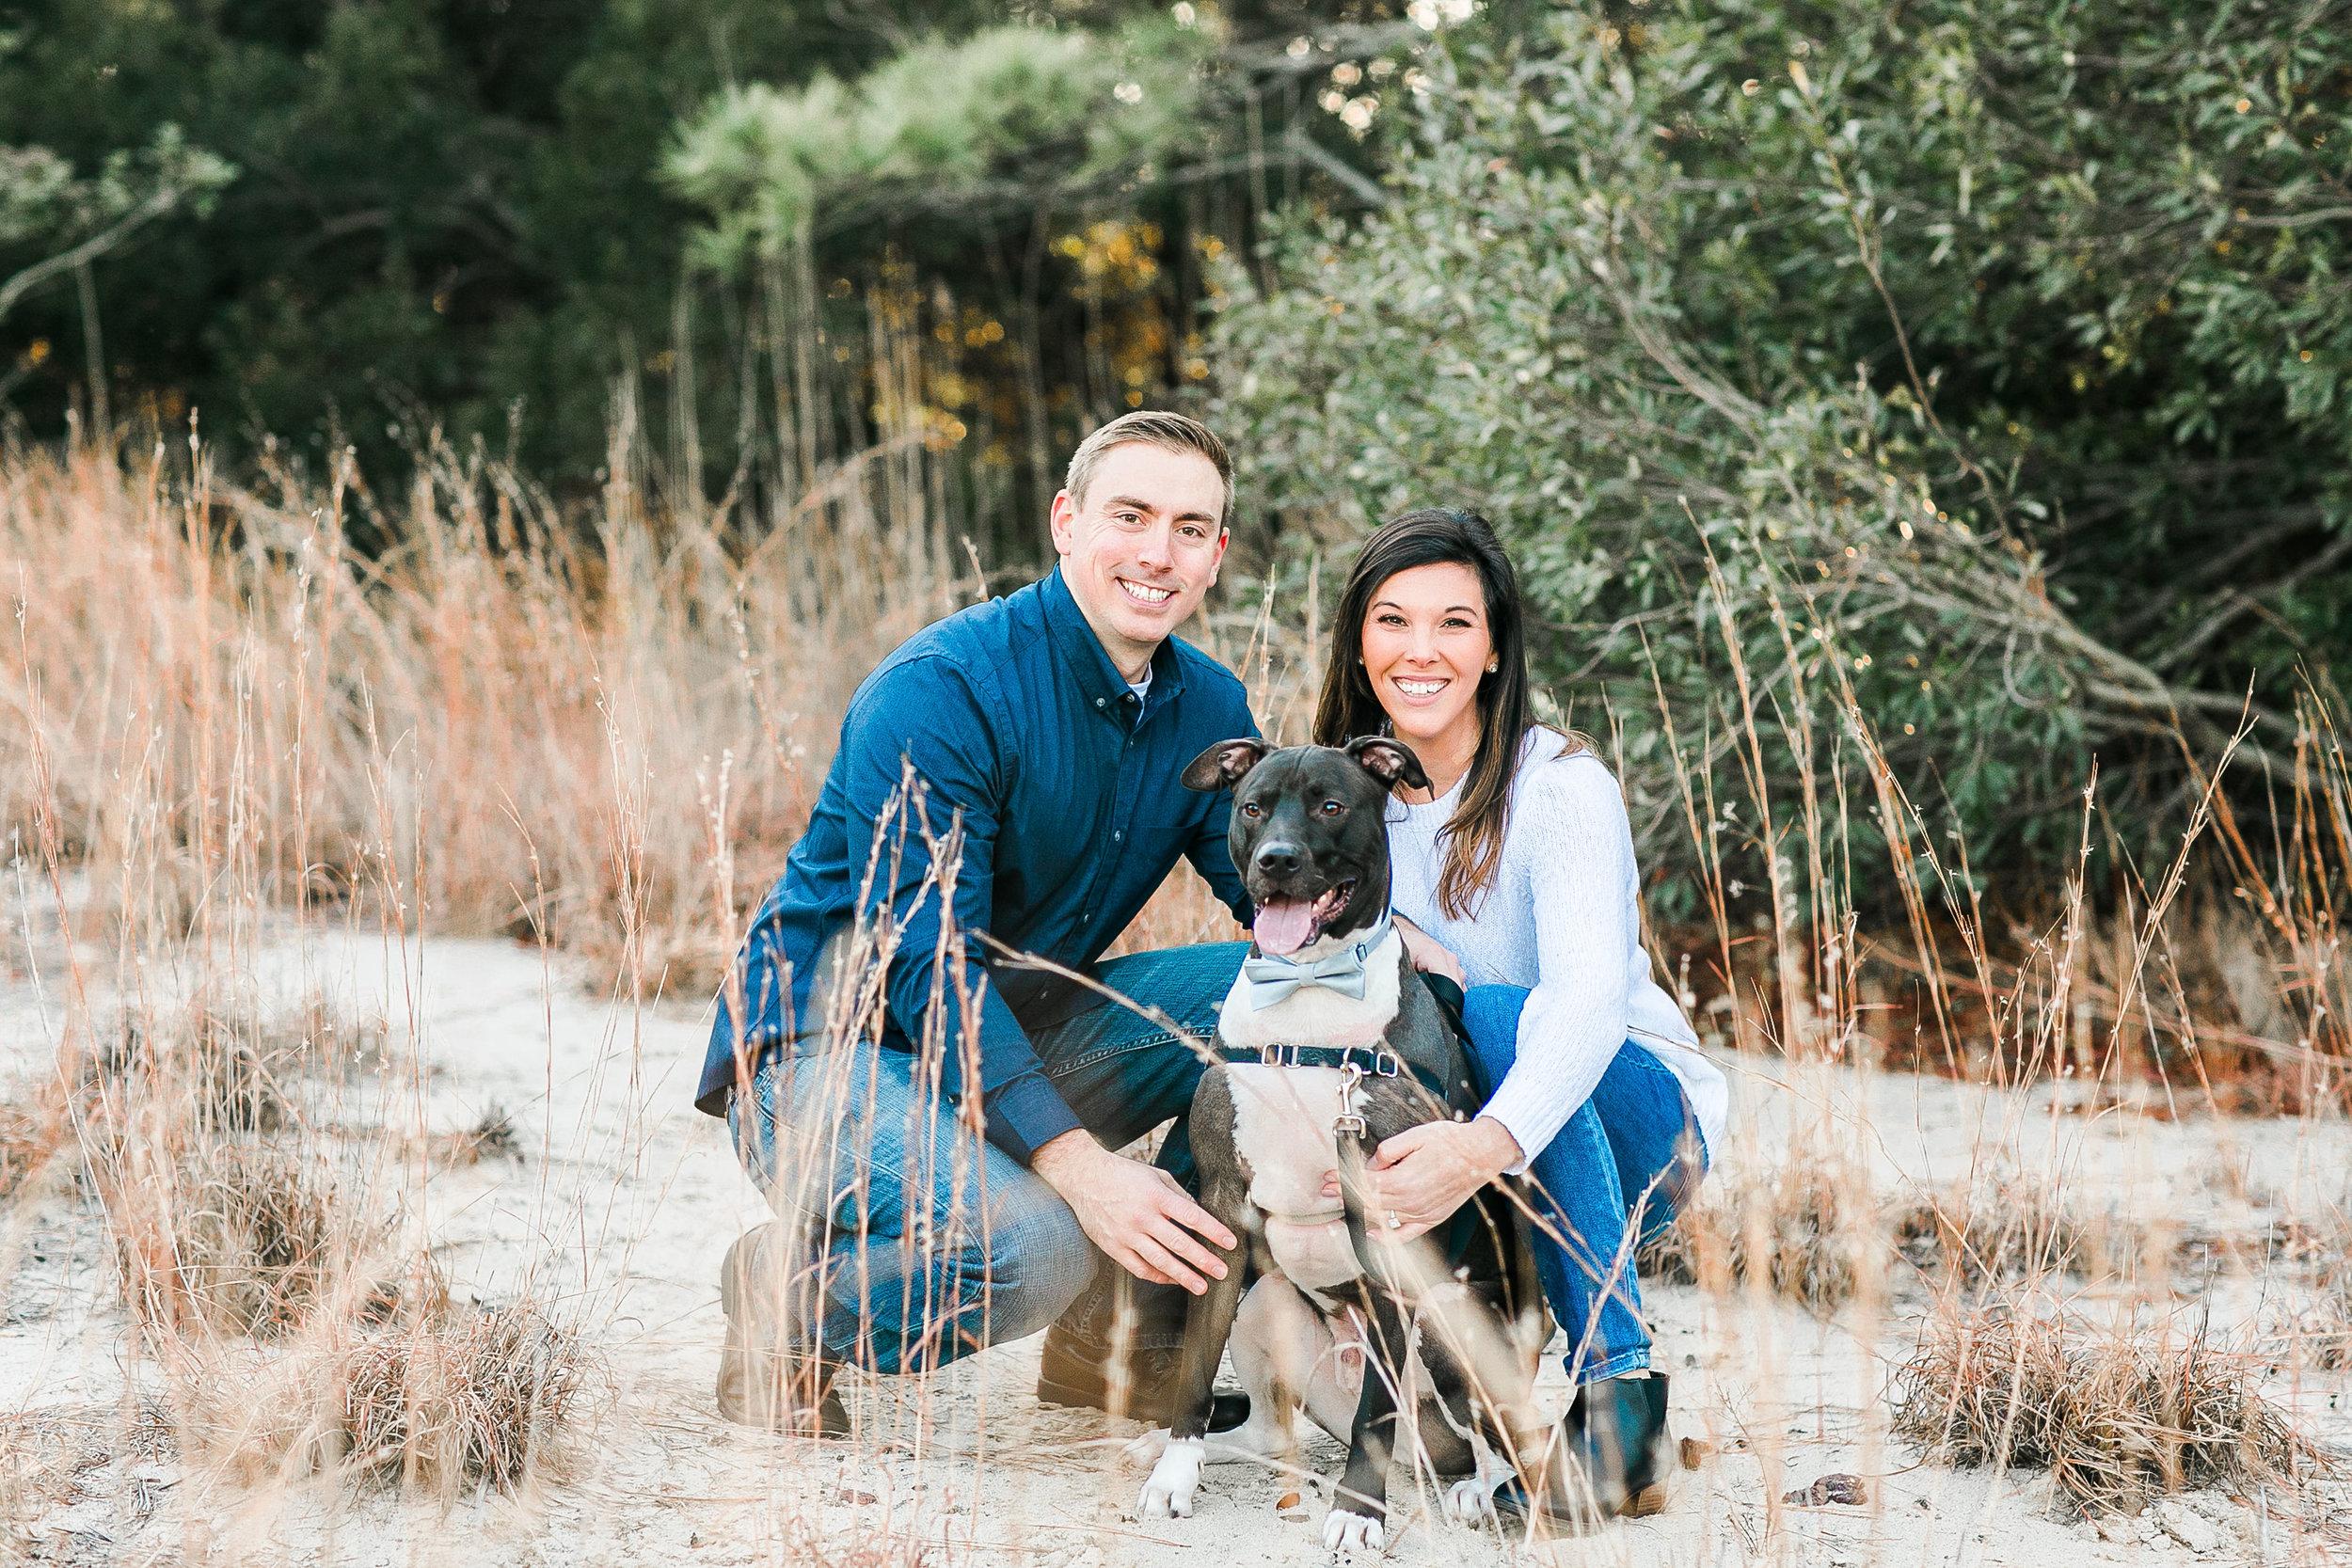 Nicole&Dustin_Engaged-24.jpg